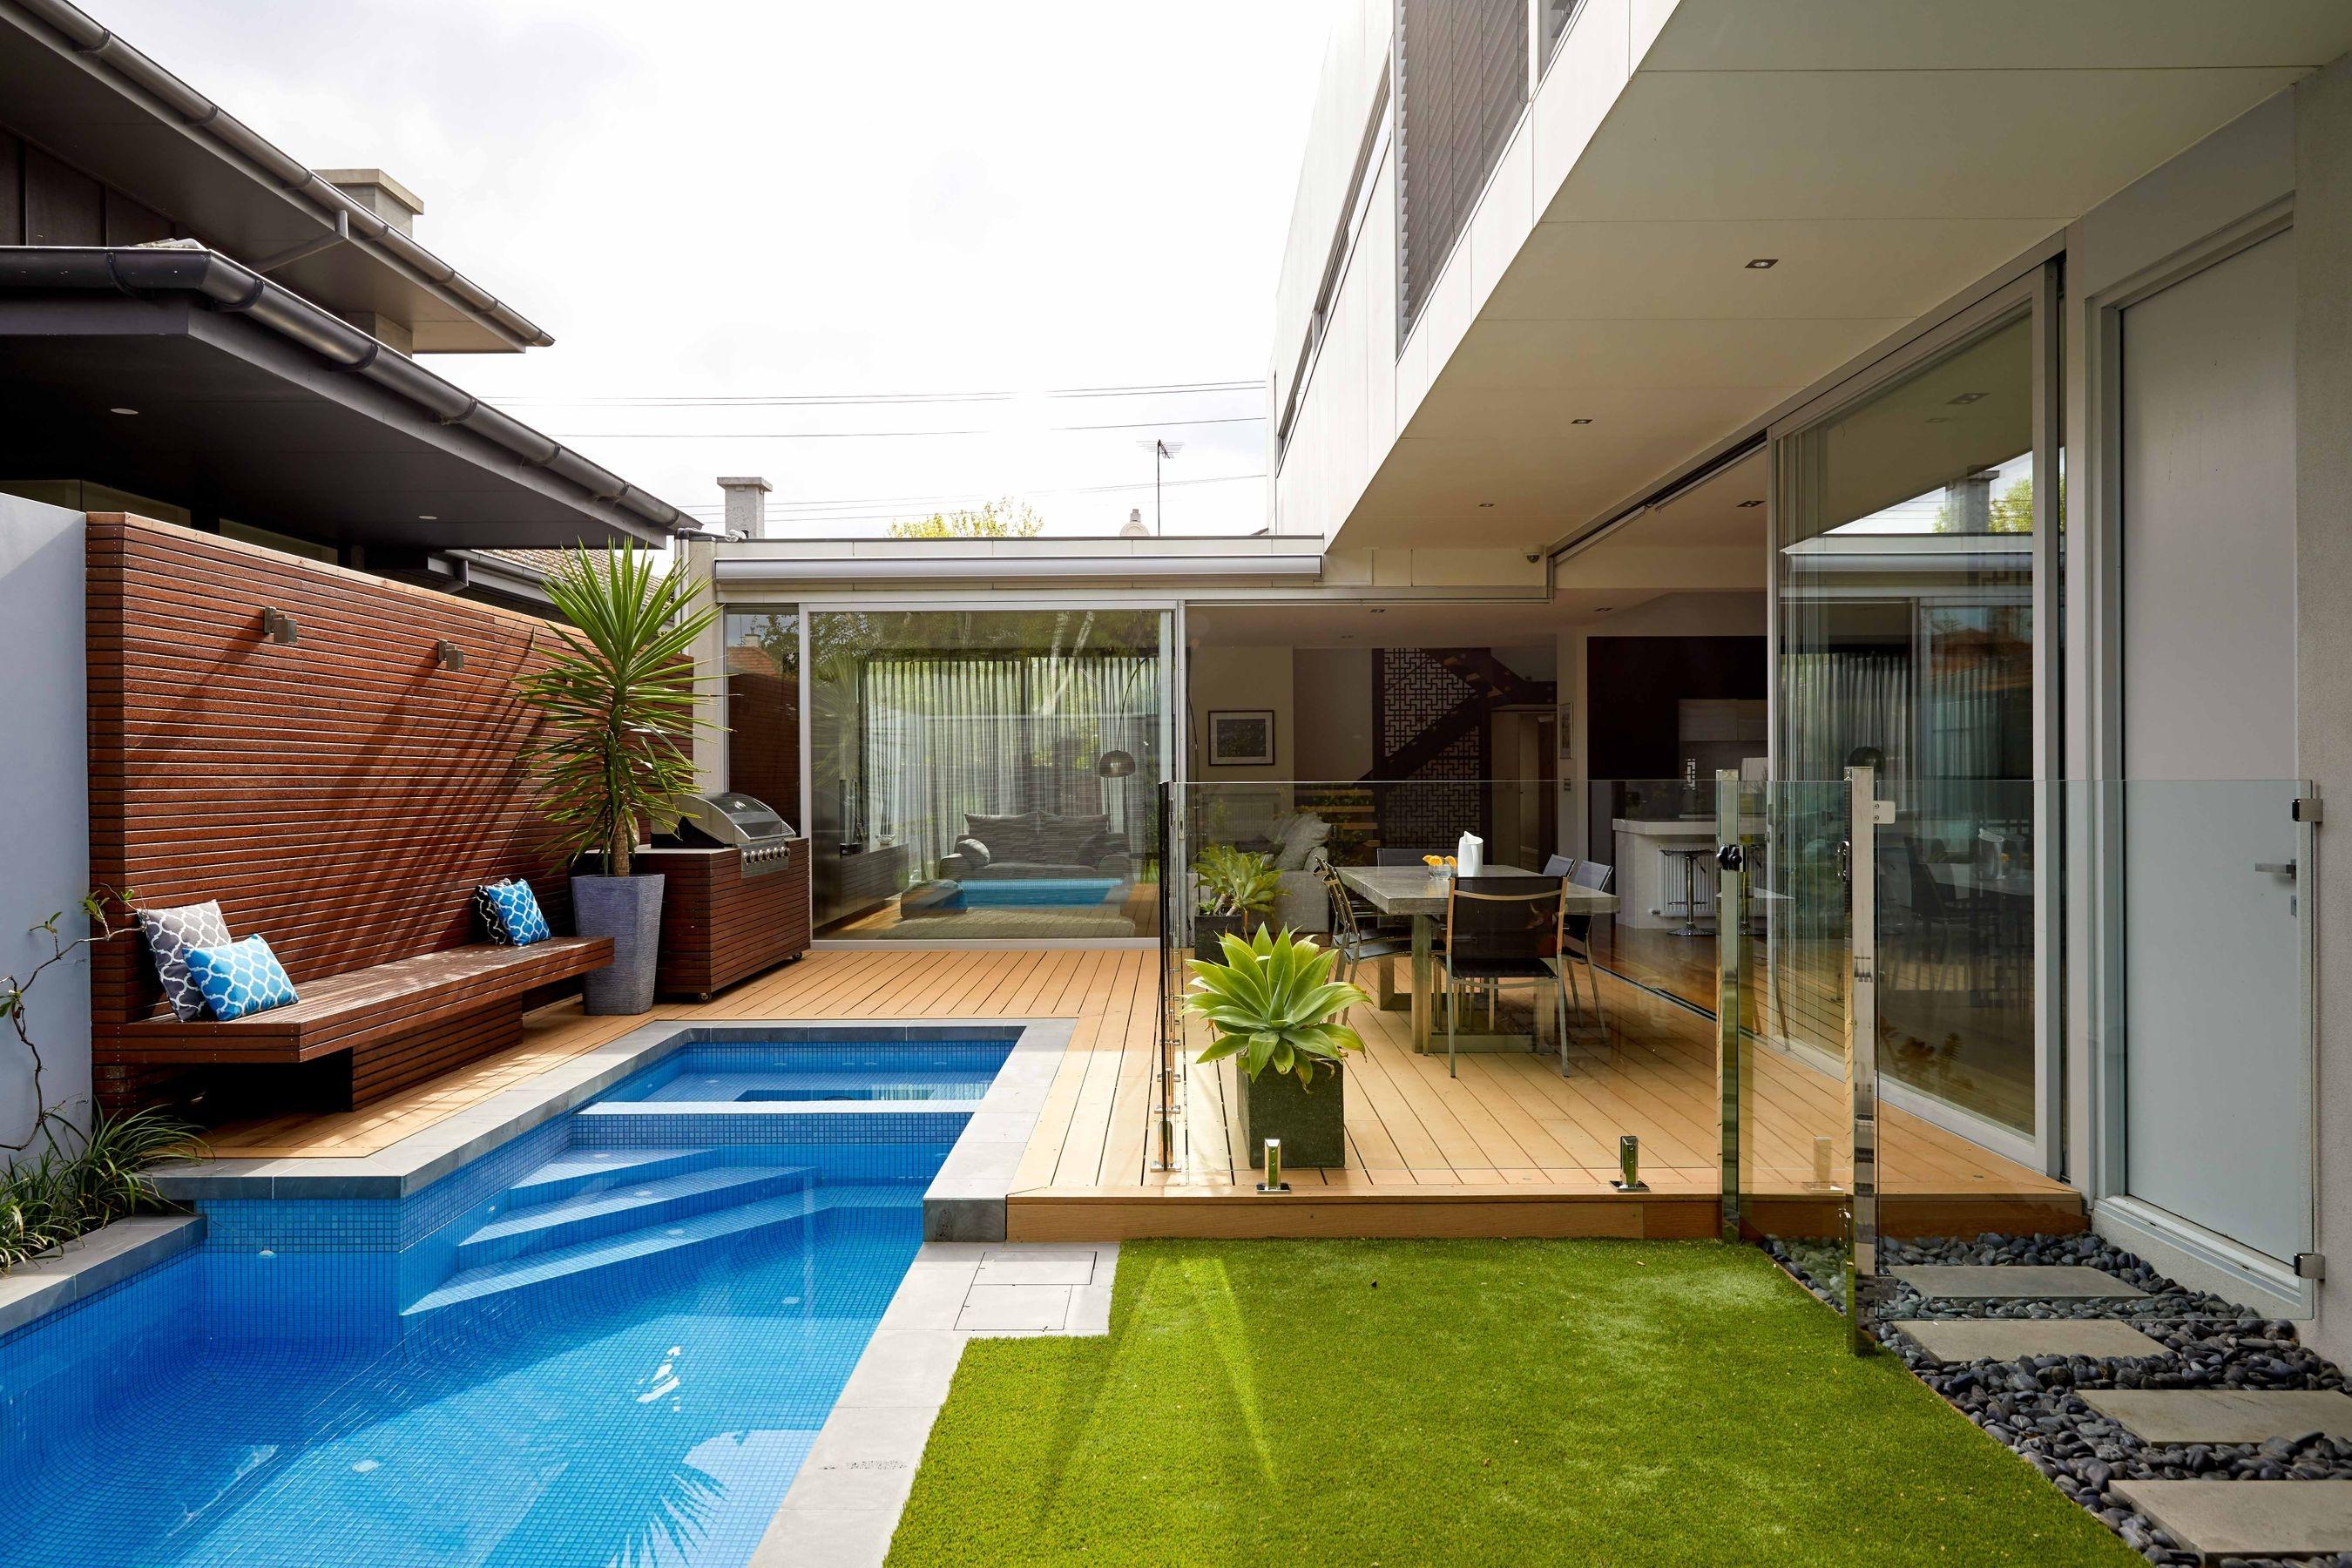 Oceania - Australia - Victoria area - Melbourne area - Elwood Beach House - Image 1/27